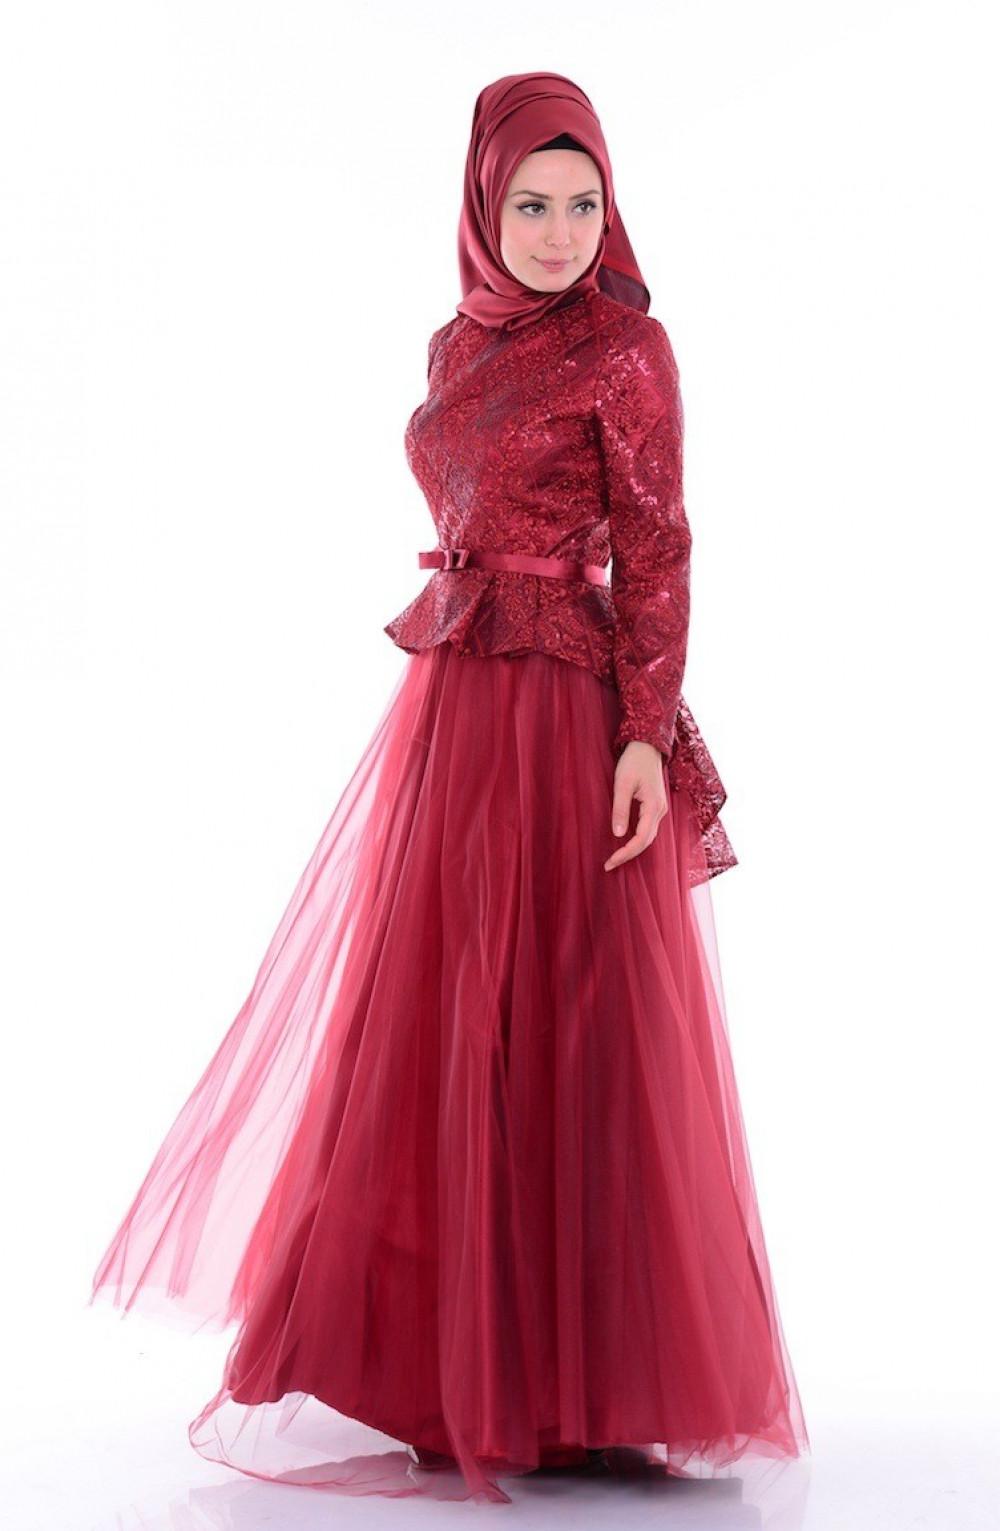 2e8a1ff5ec886 Sefamerve Tül Pullu Kırmızı Abiye Elbise   Ehl-i Tesettür